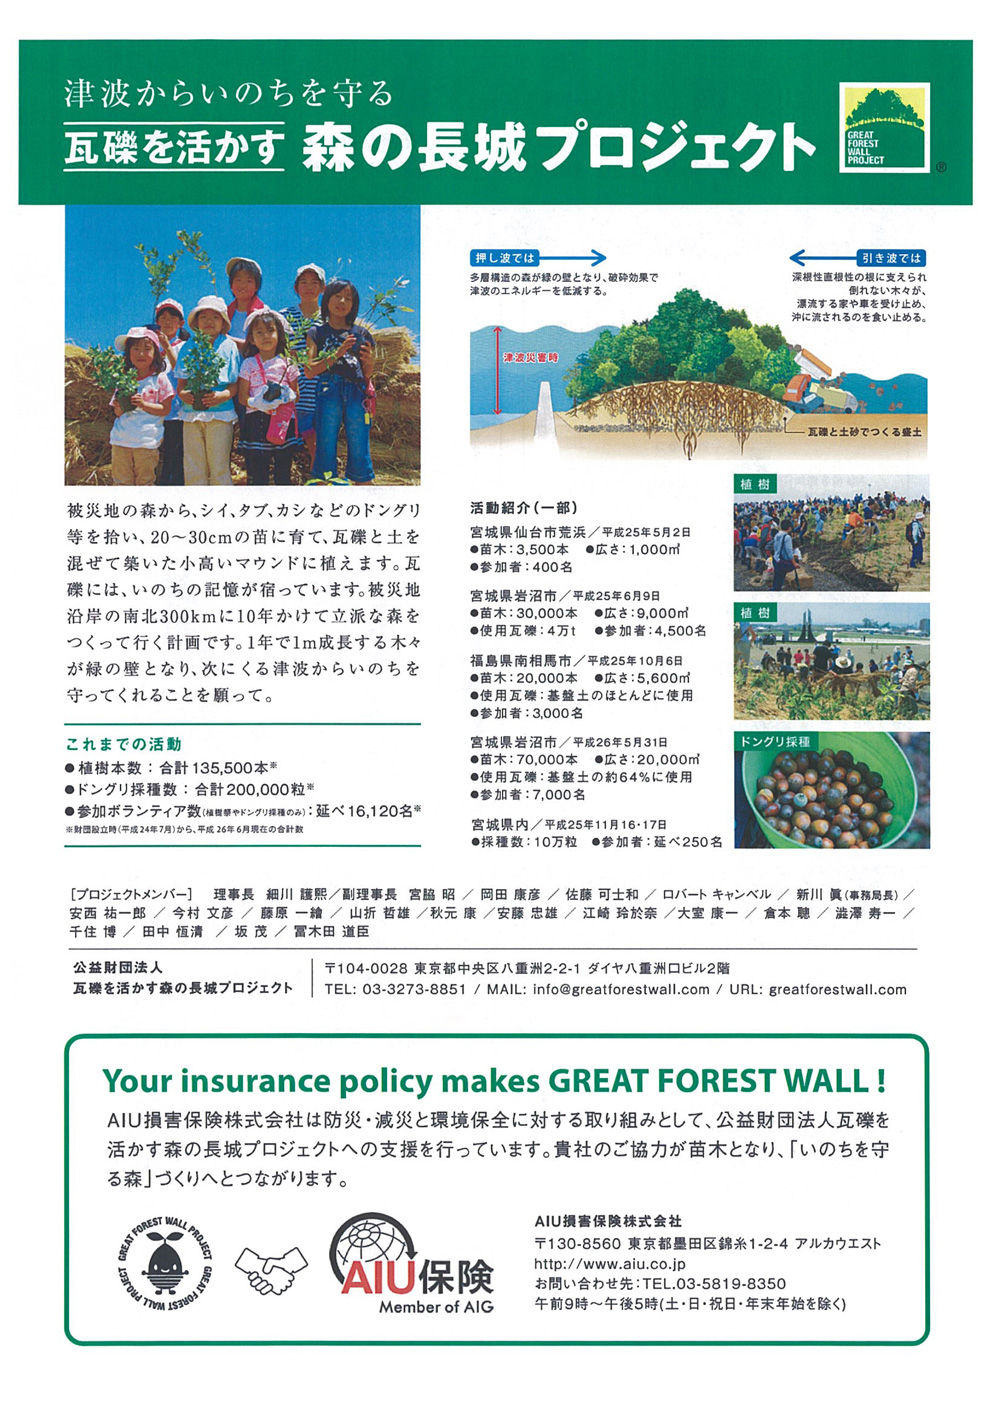 http://www.joyakuken.co.jp/topics/aiu_1.jpg